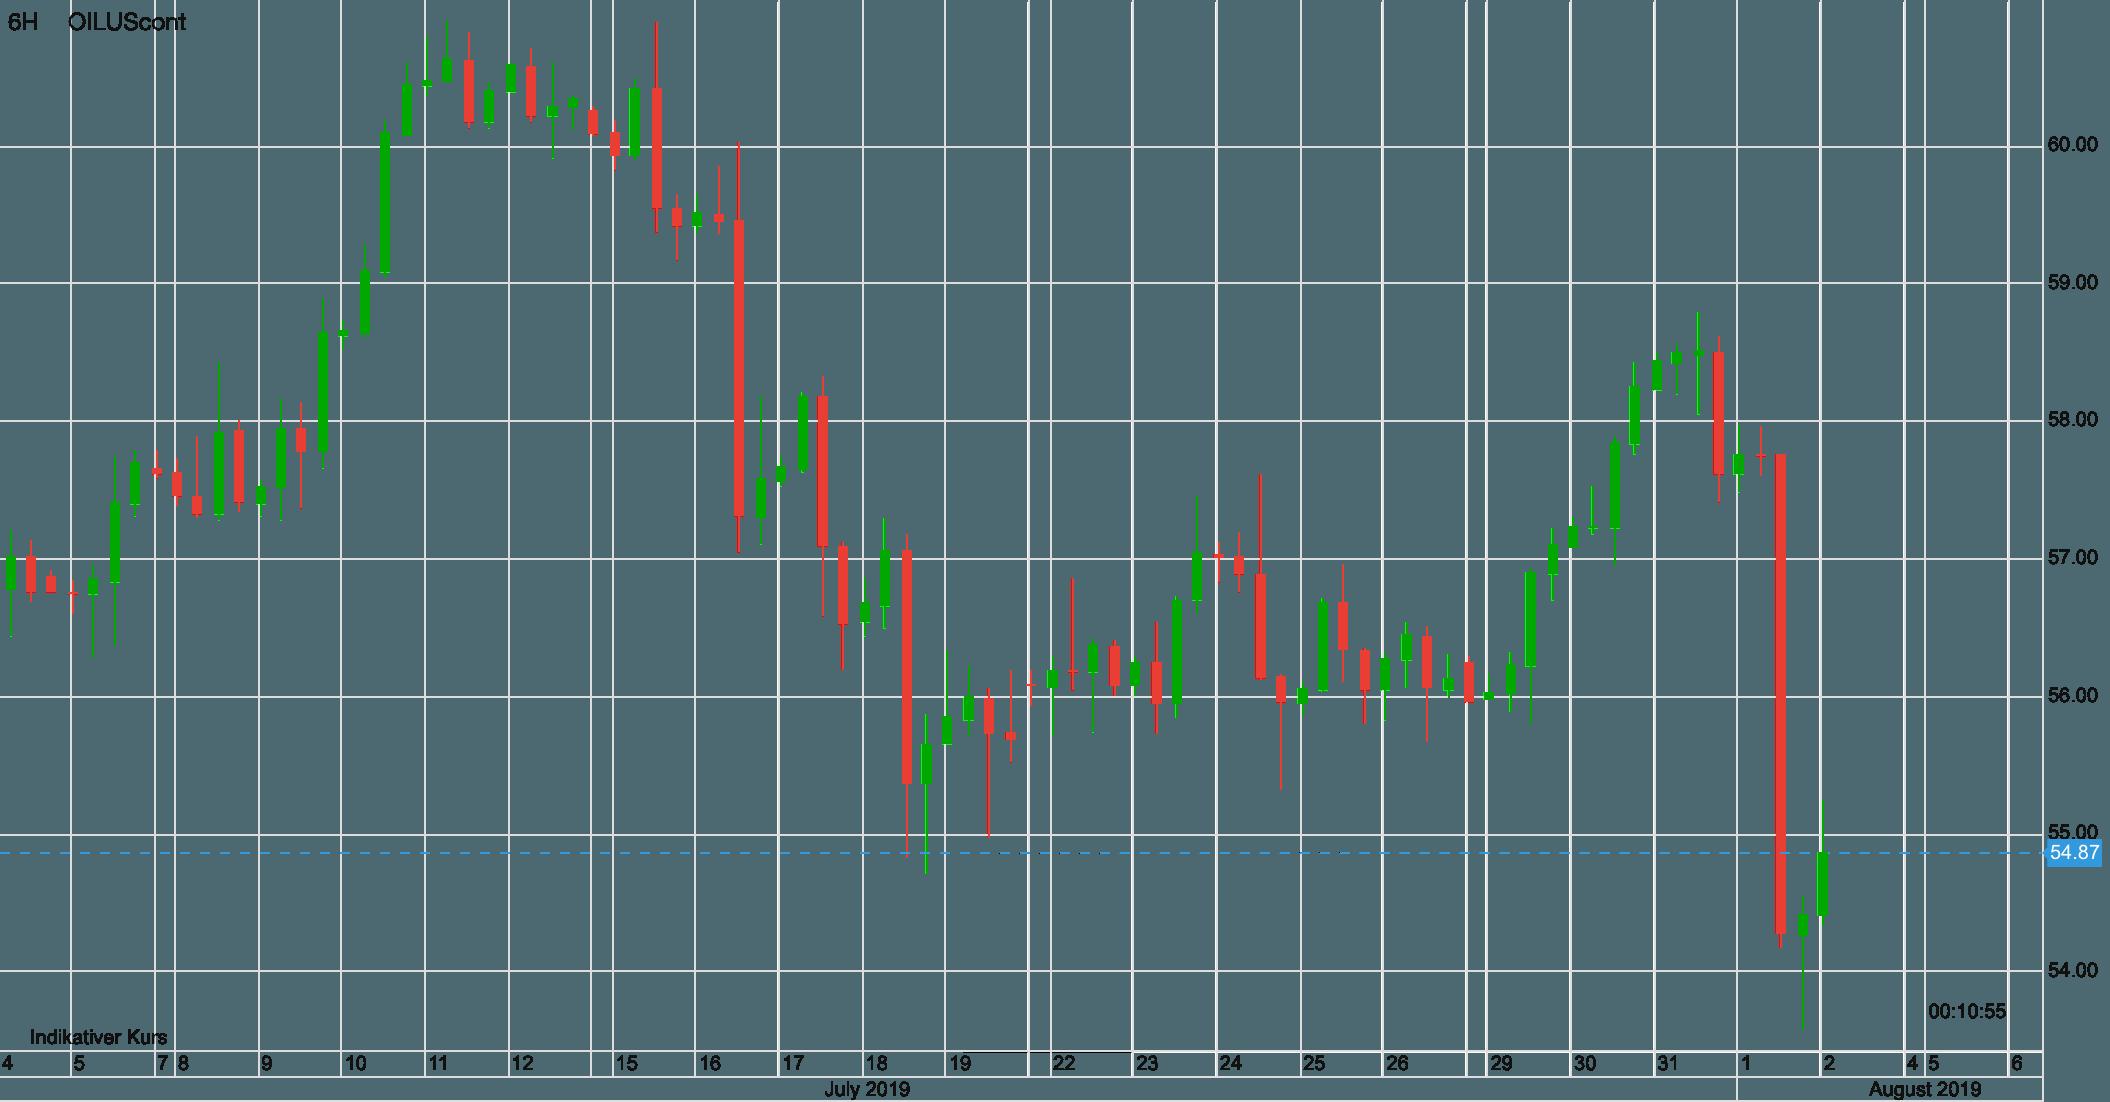 Ölpreis WTI Verlauf seit Anfang Juli